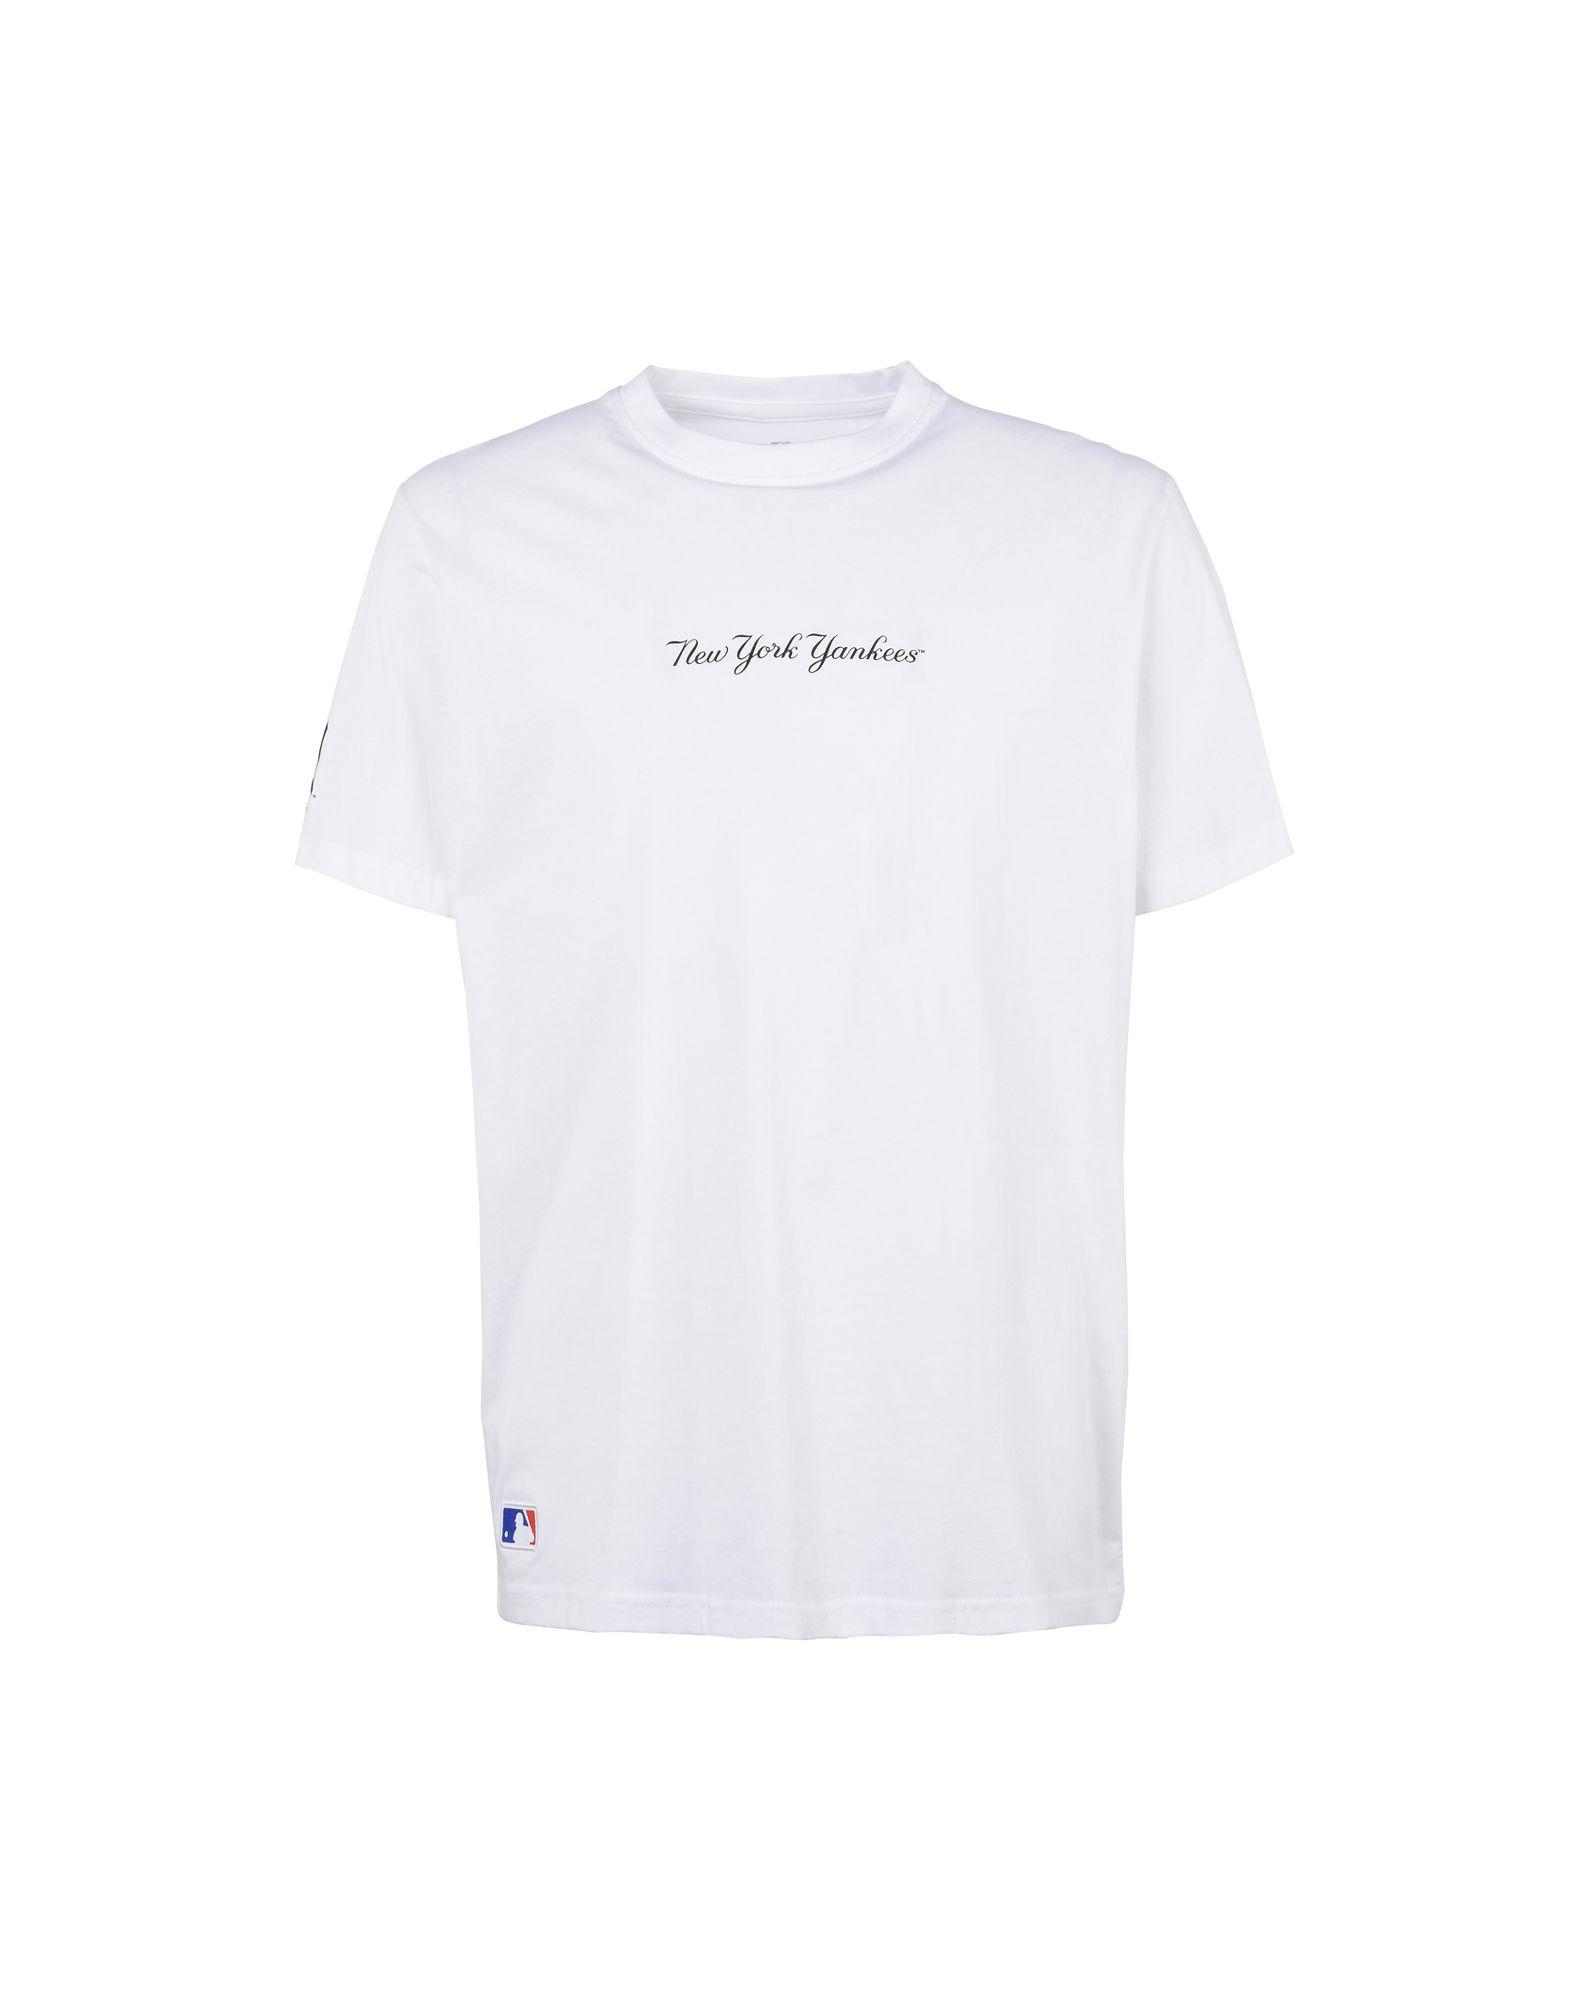 MLB ELEGANCE XL TEE LOS ANGELES DODGERS - CAMISETAS Y TOPS - Camisetas New Era ZduNqOpyG